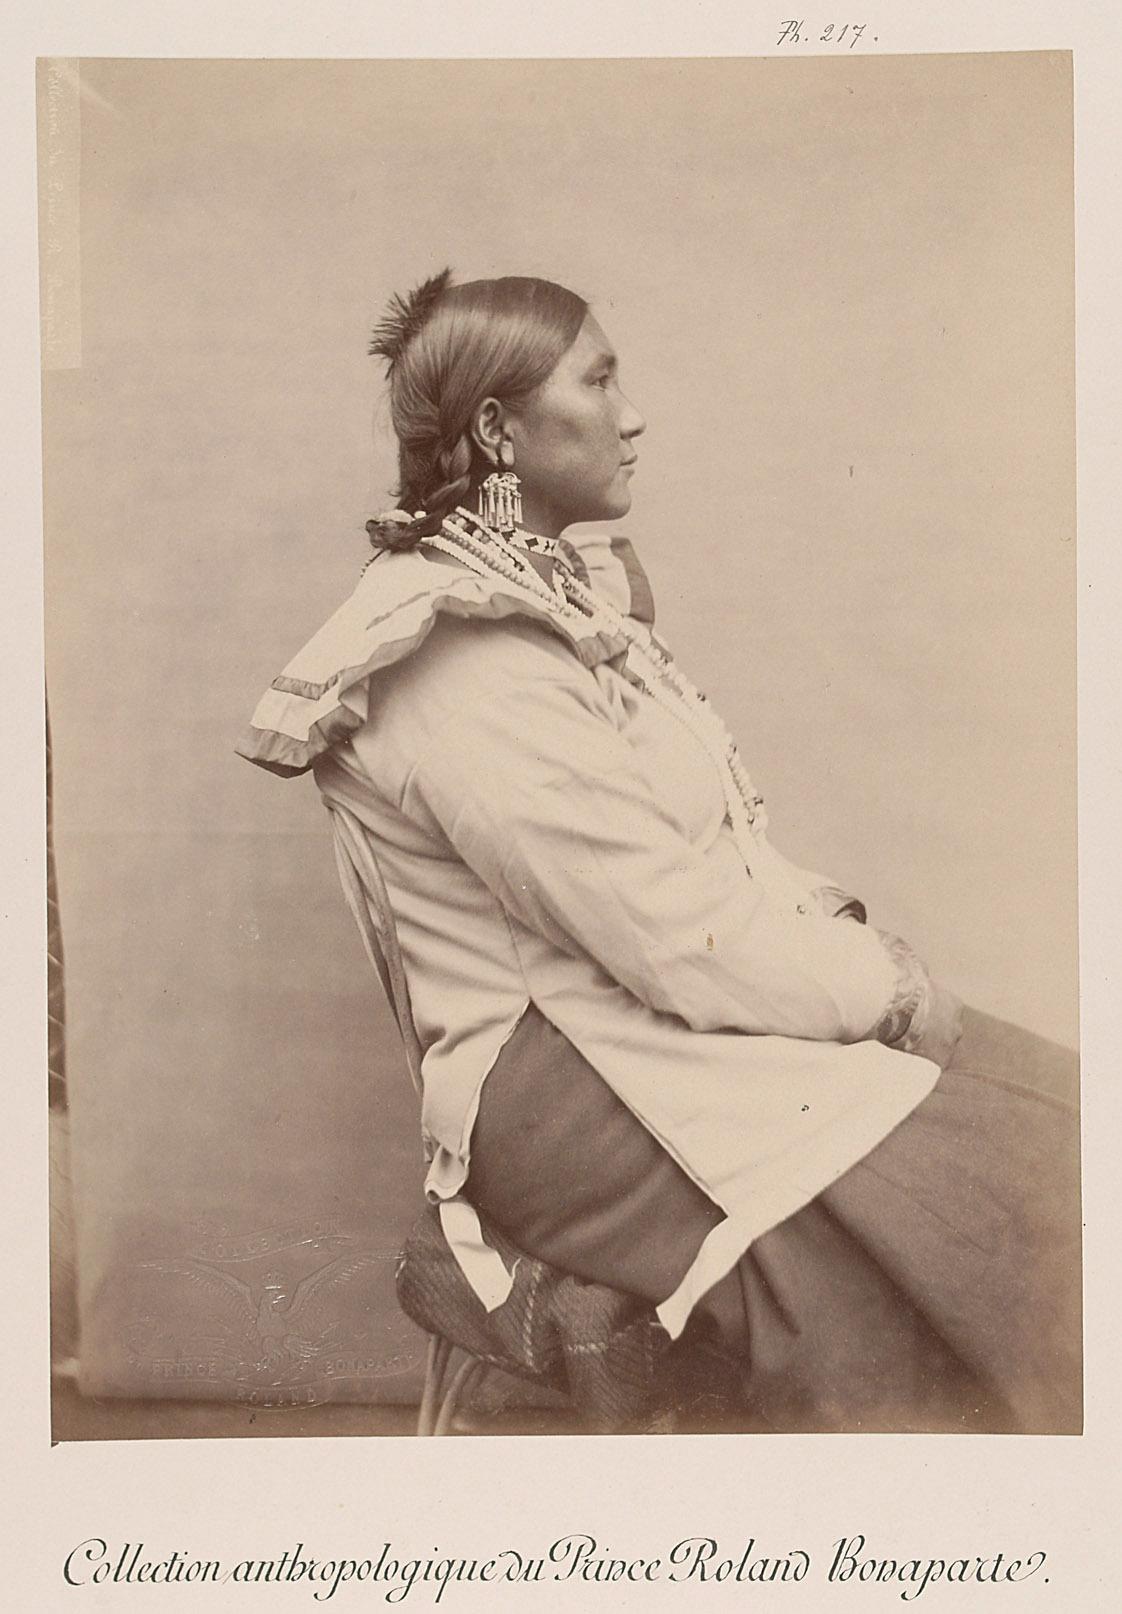 White Cow - Tessah-vih, Frau, Profilansicht von Prinz Roland Napoléon Bonaparte